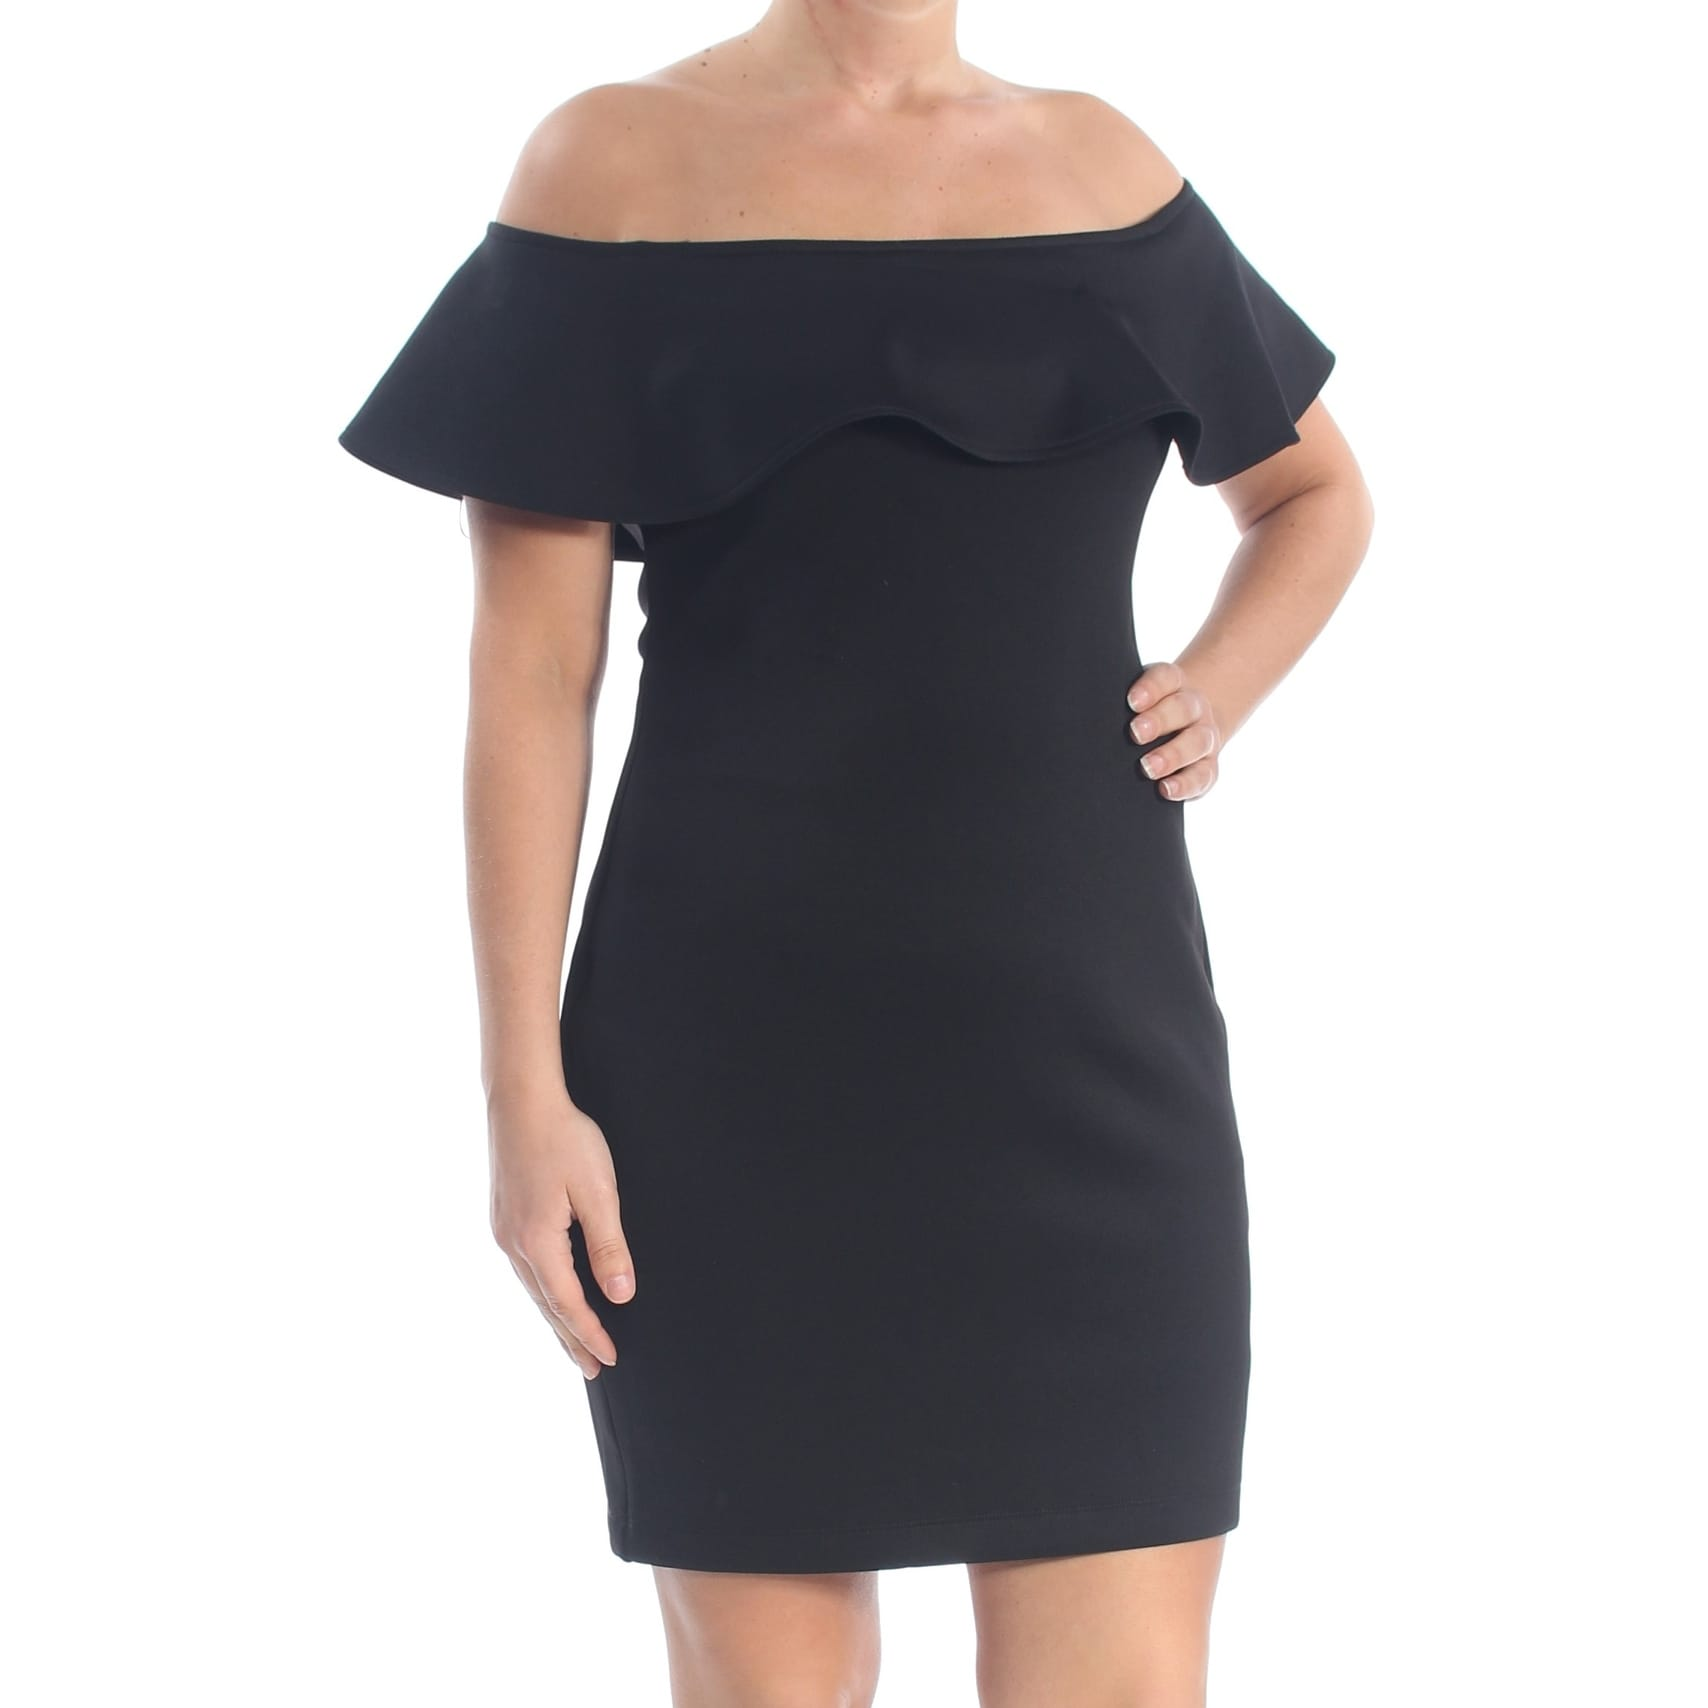 GUESS Womens Black Ruffled Short Sleeve